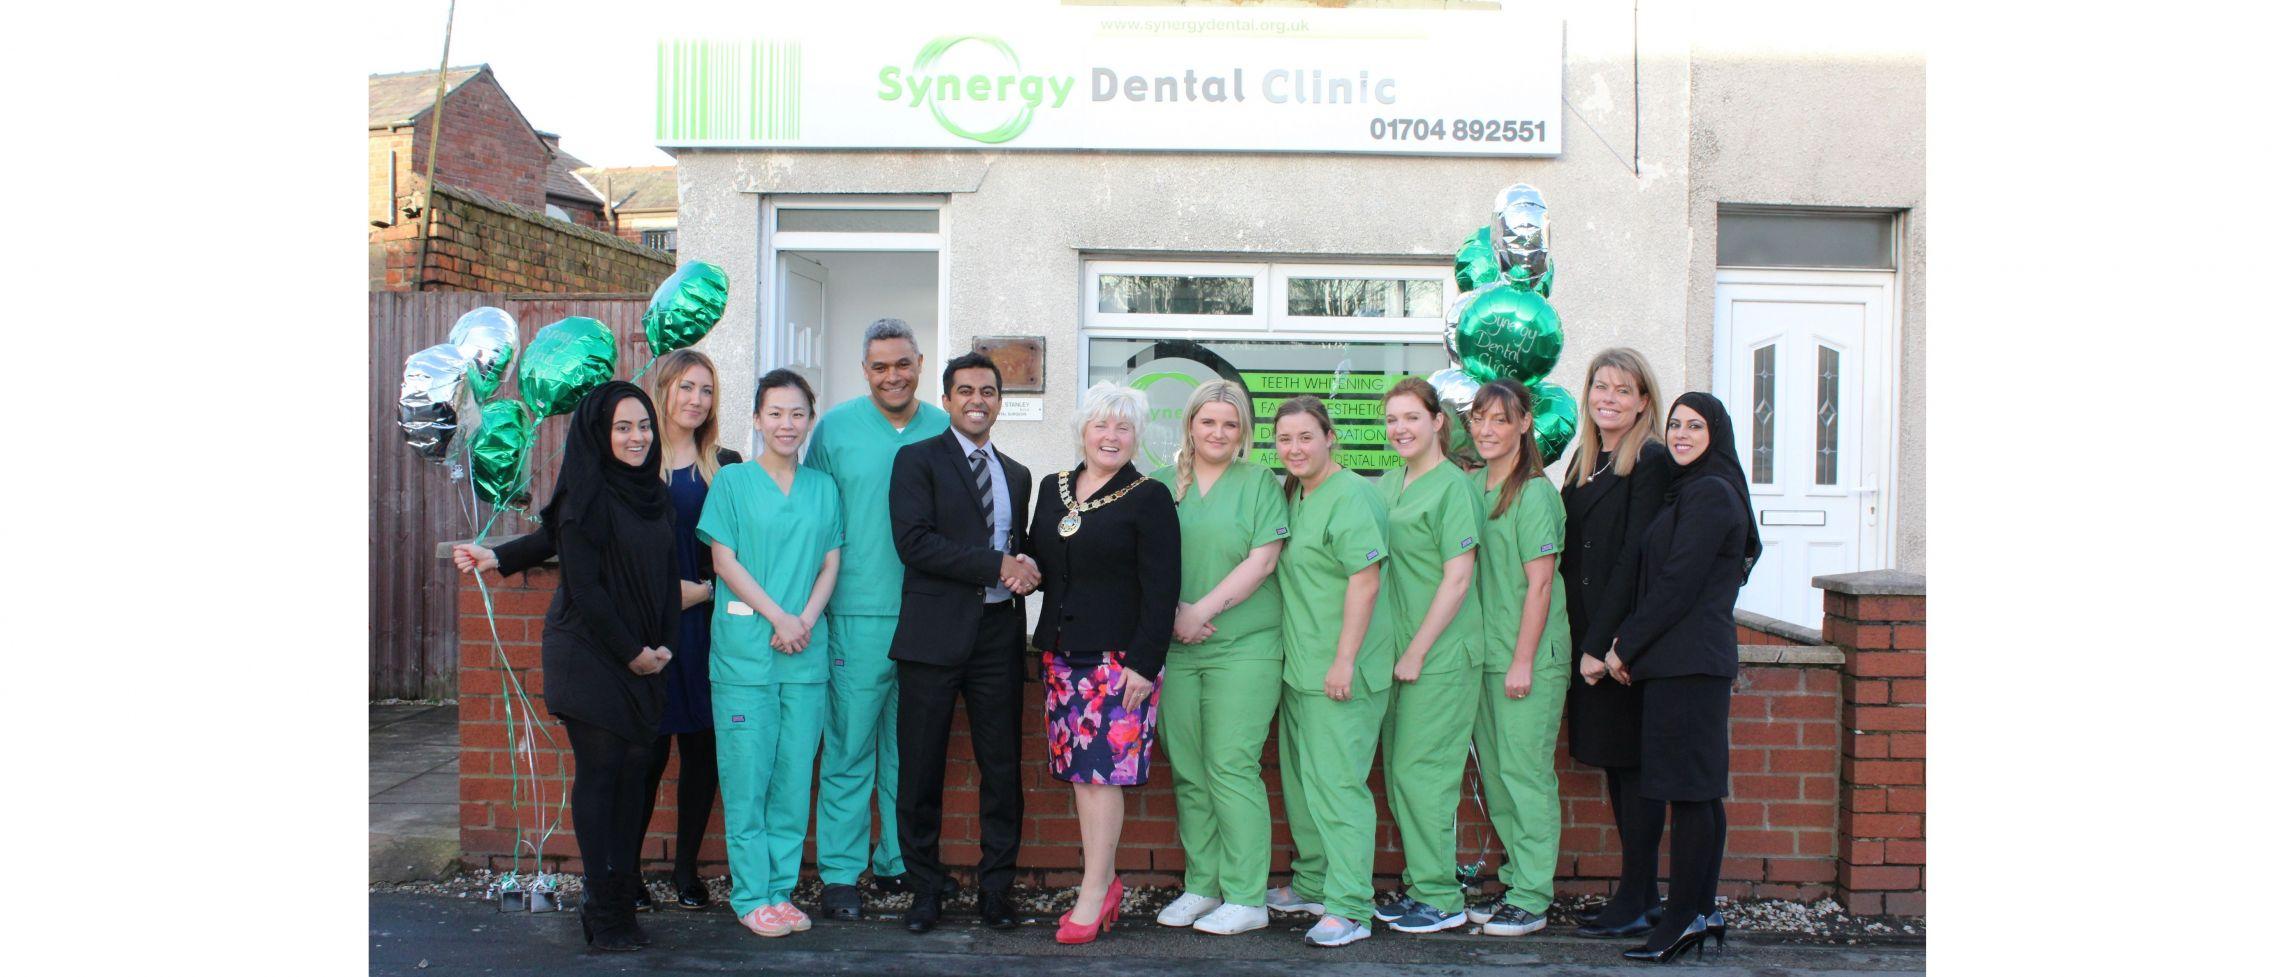 Team Ormskirk Dental